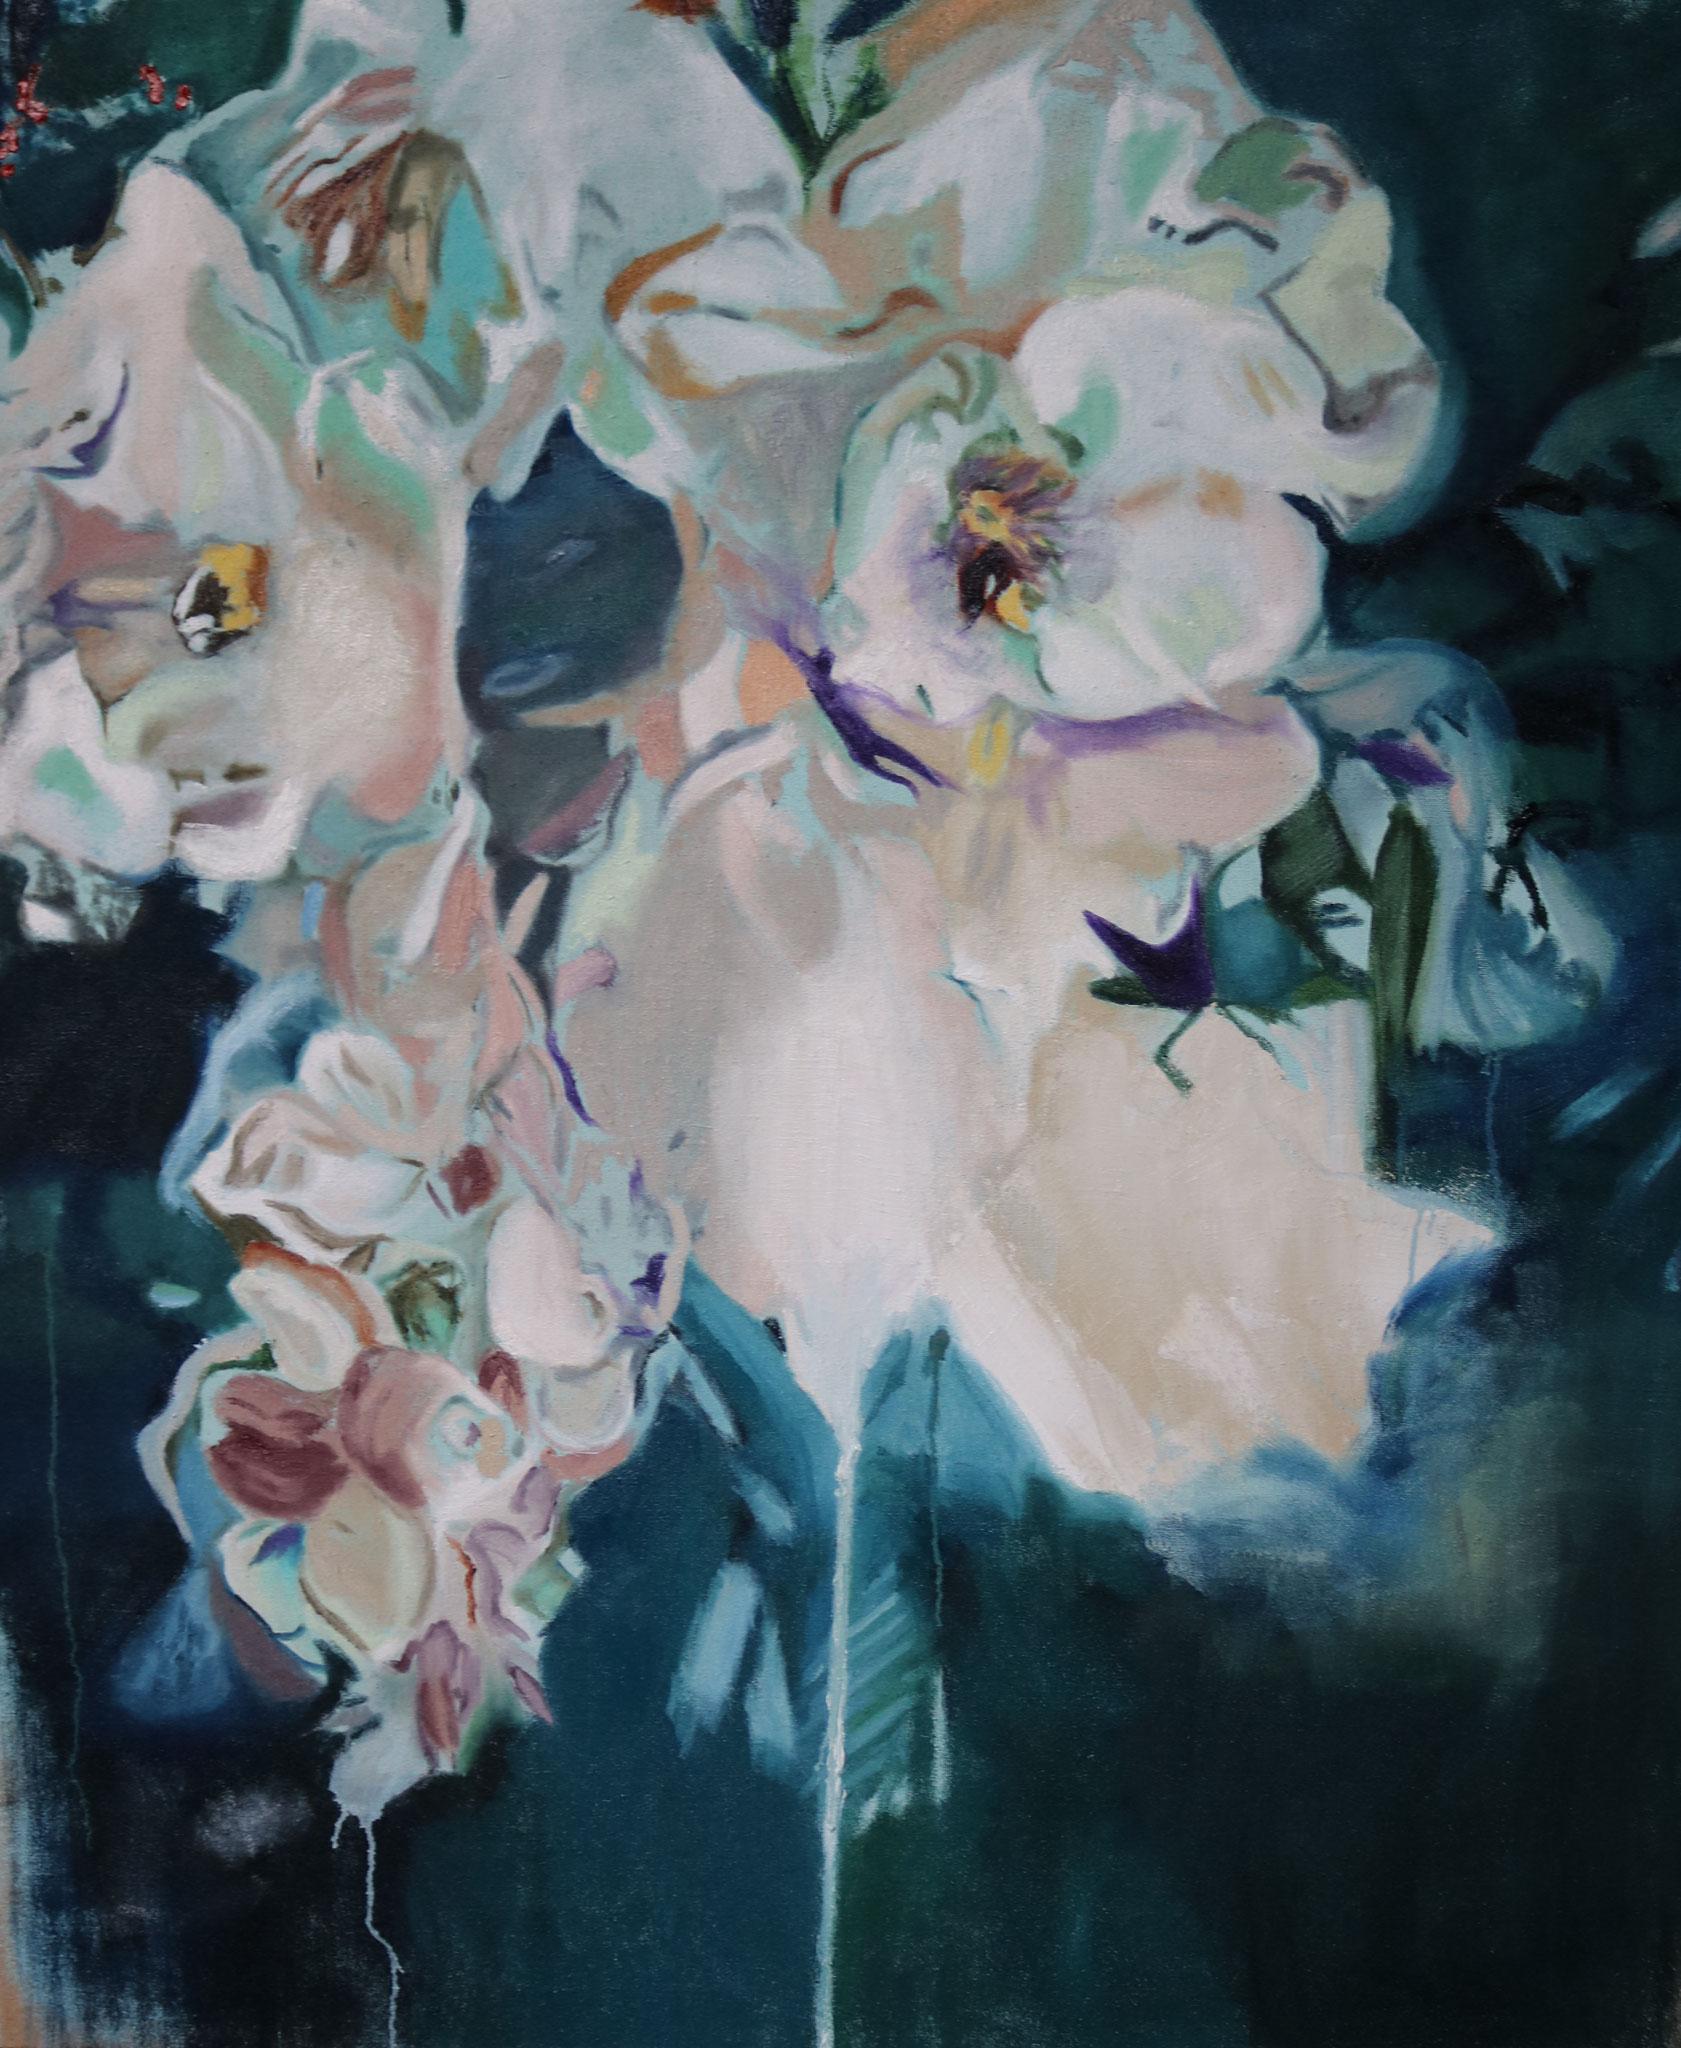 """Blumen I"" 145 x 180 cm - Öl auf Leinwand 2017"